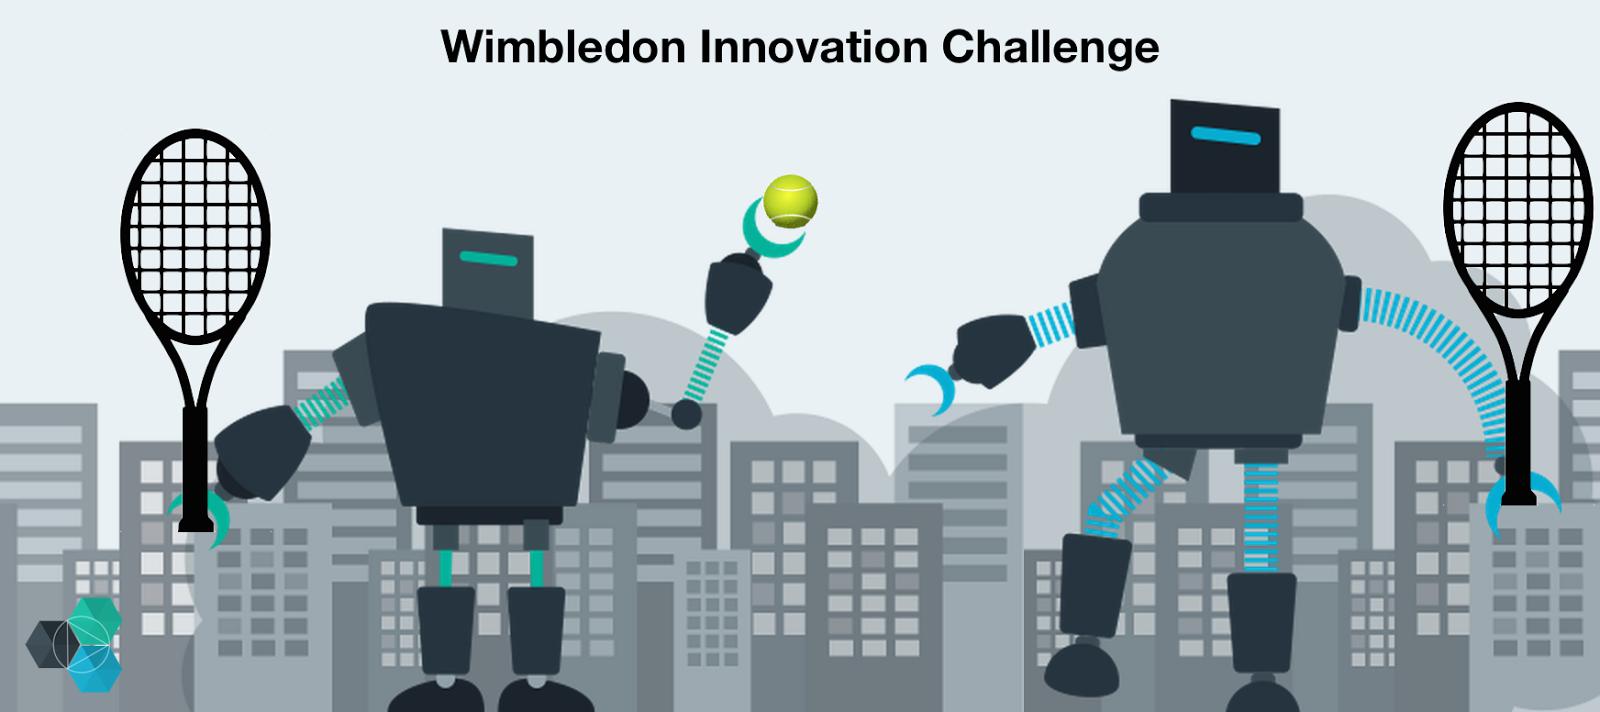 Bluemix, Robots, and the Wimbledon Innovation Challenge